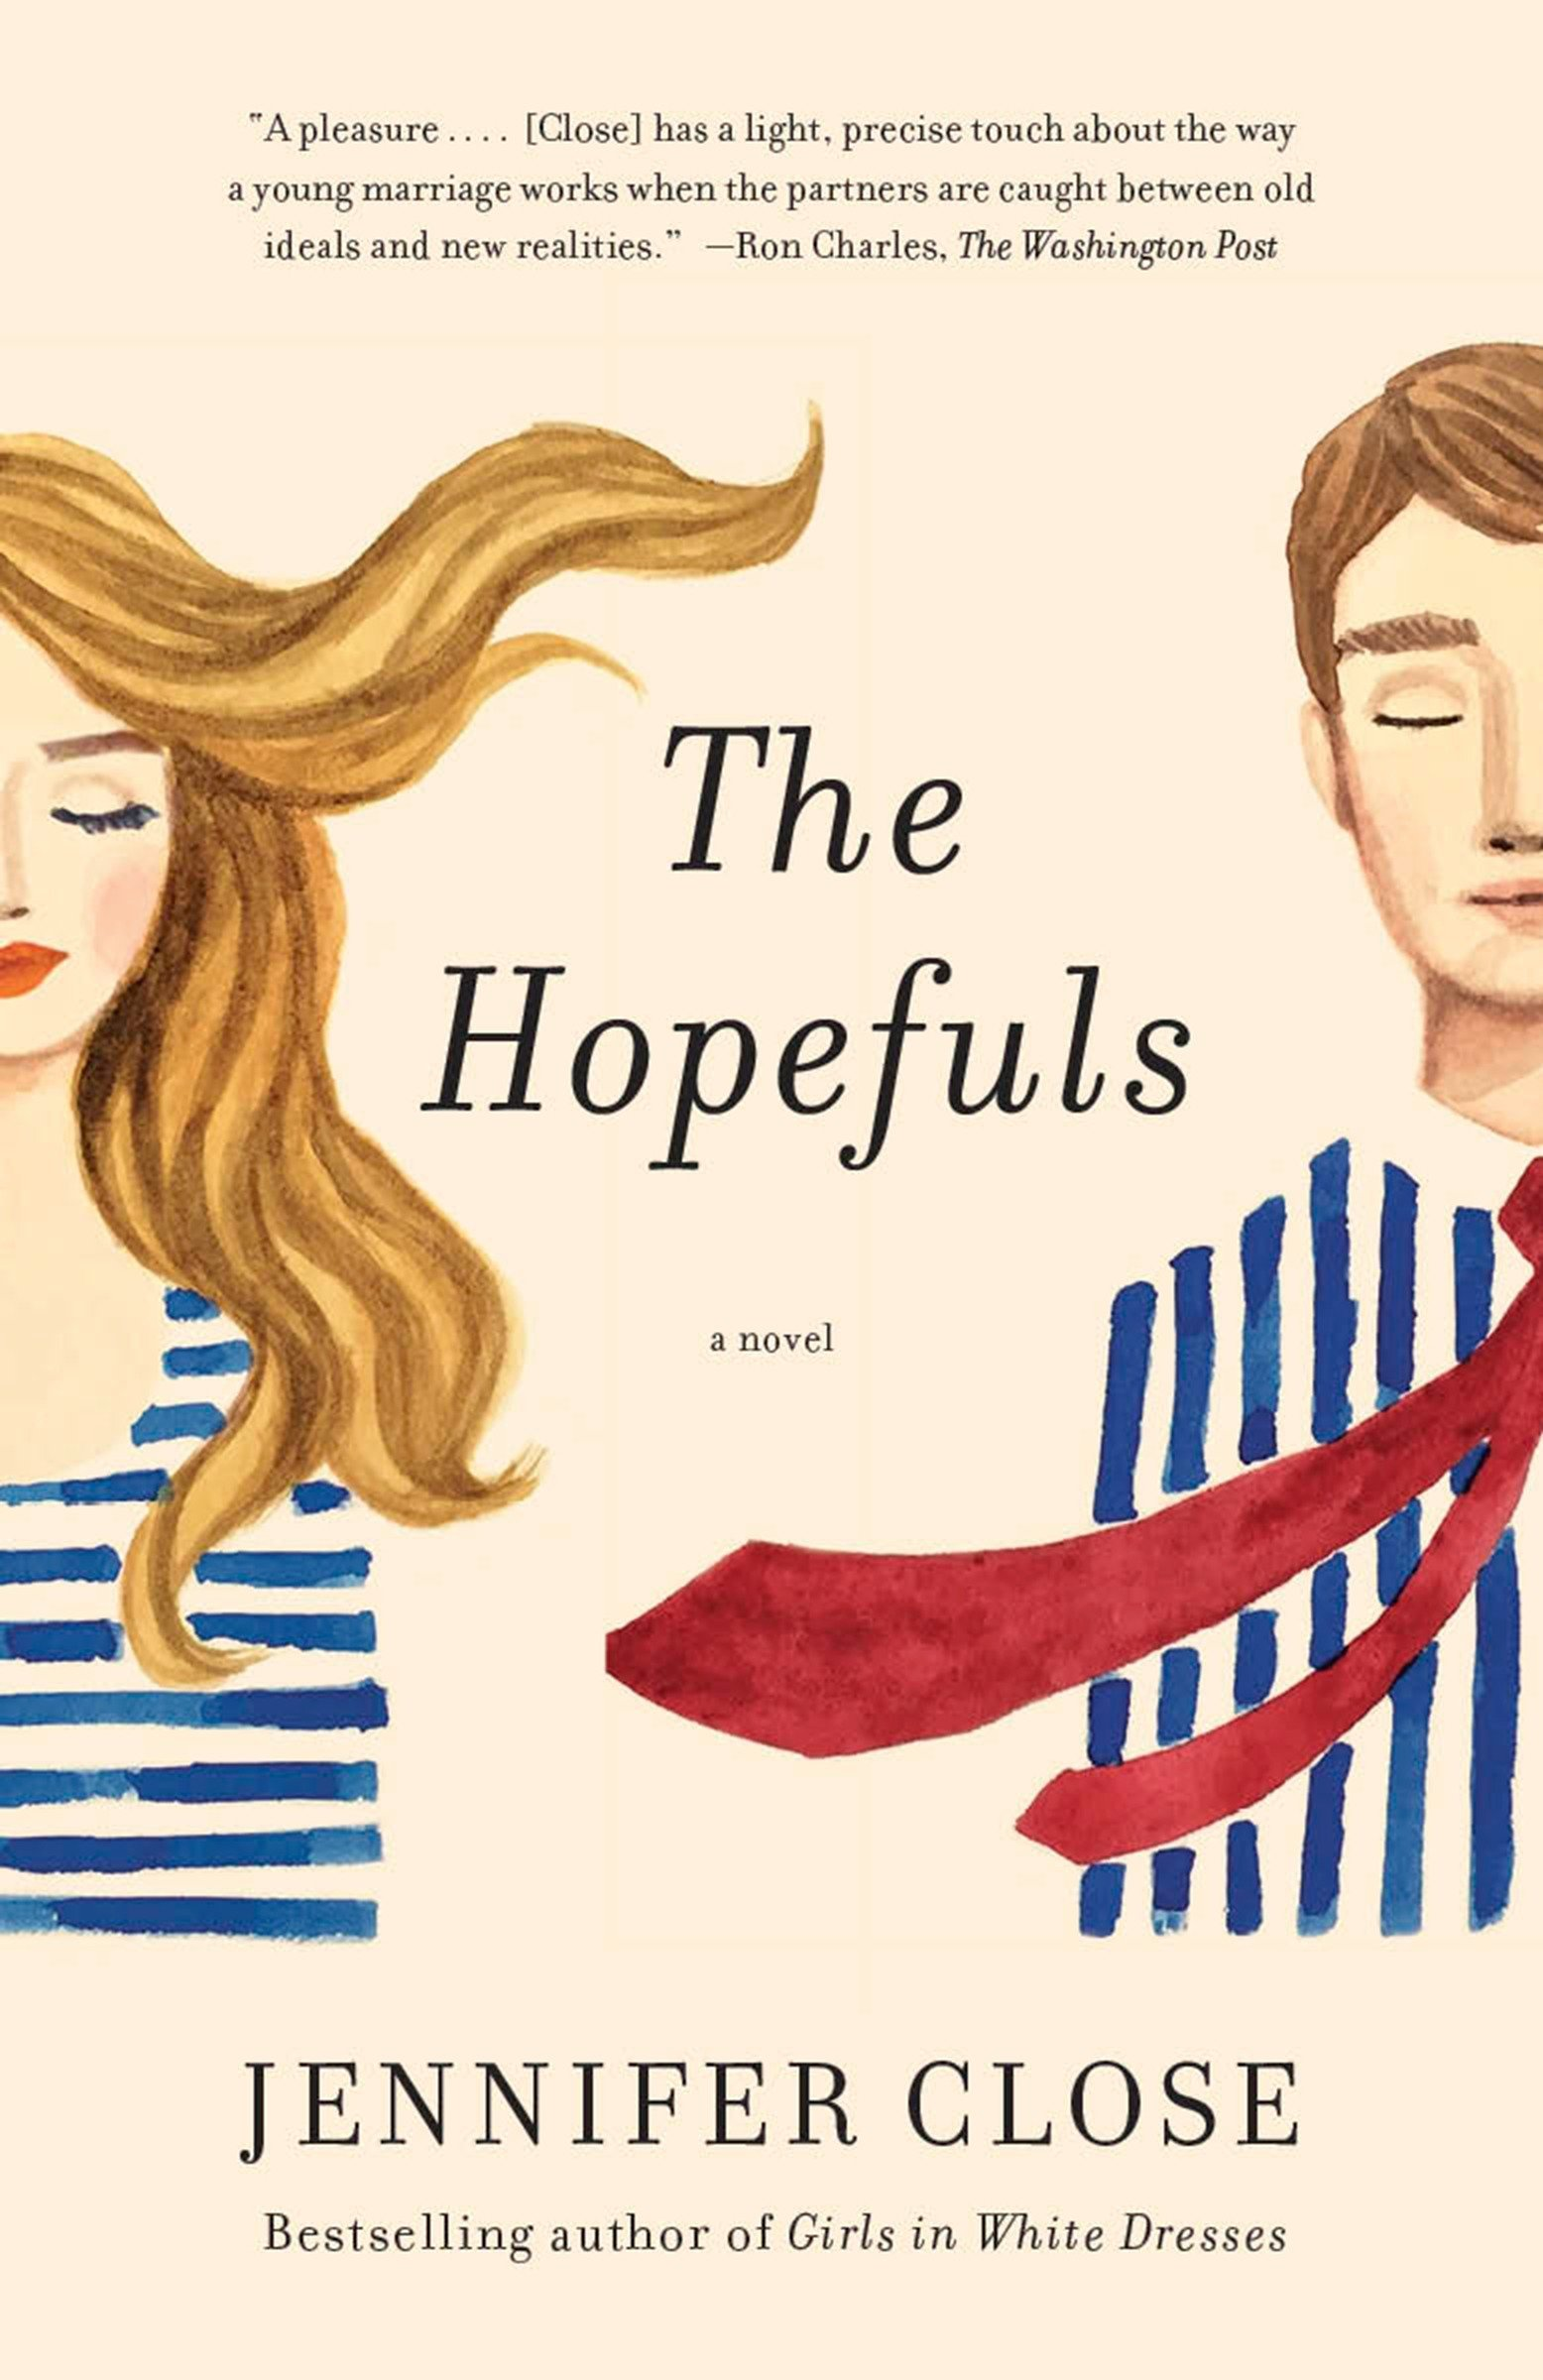 The Hopefuls Jennifer Close